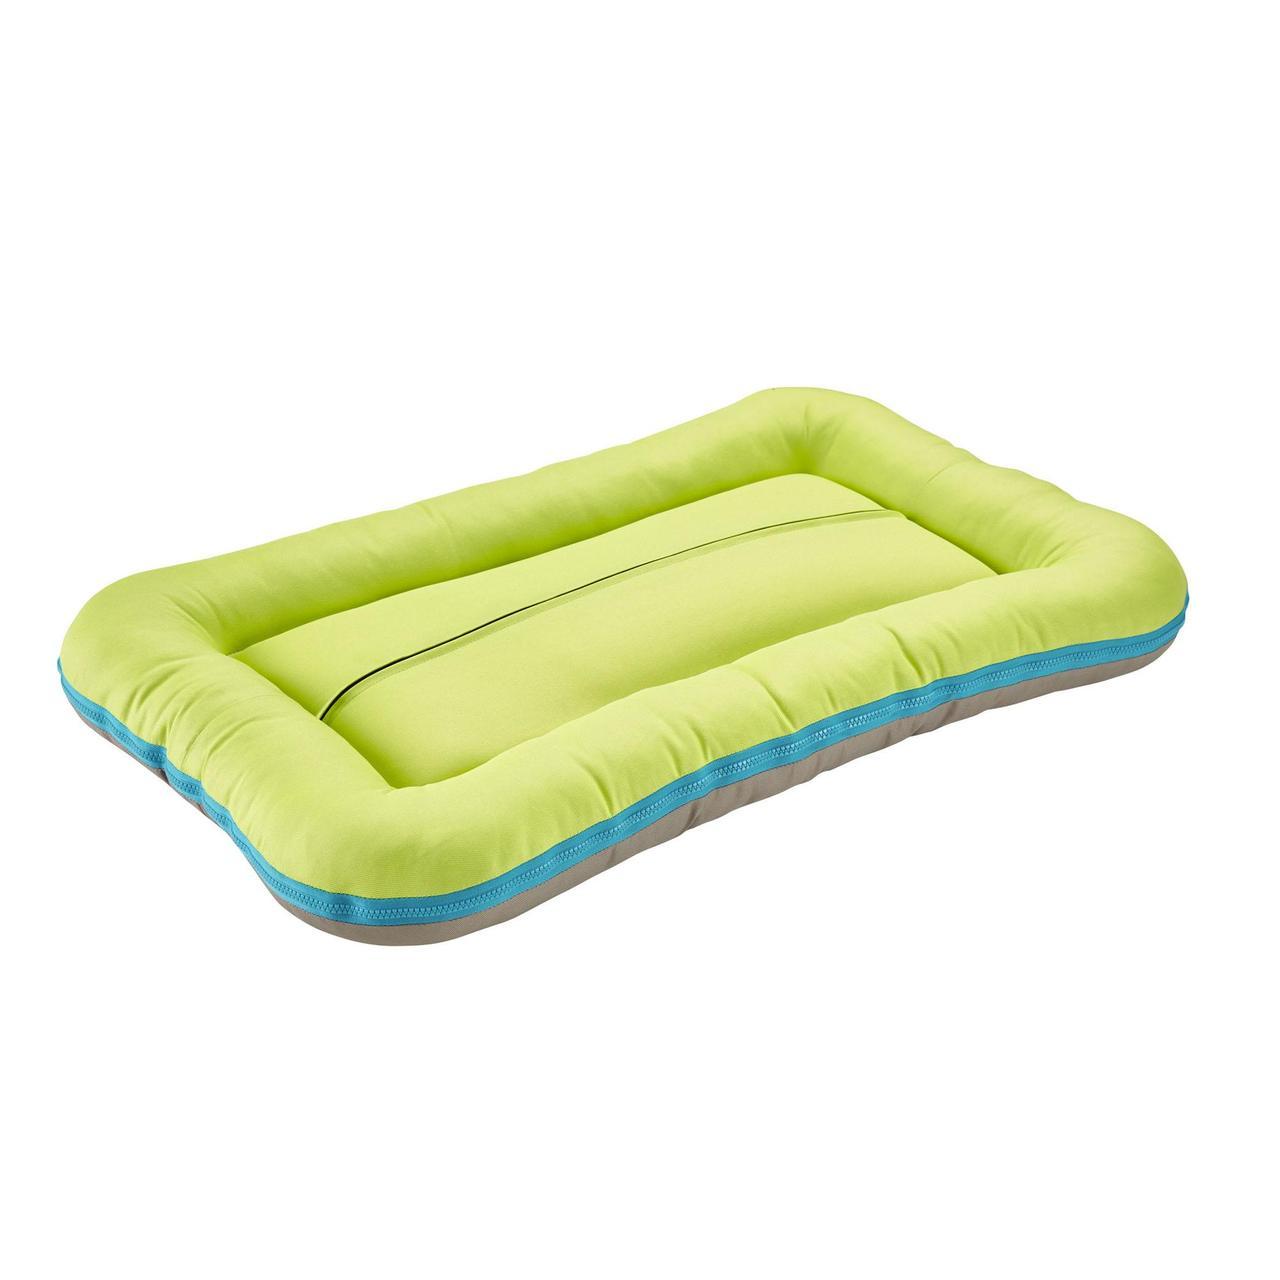 An image of Hunter Dog Cushion Milo Taupe/Lime